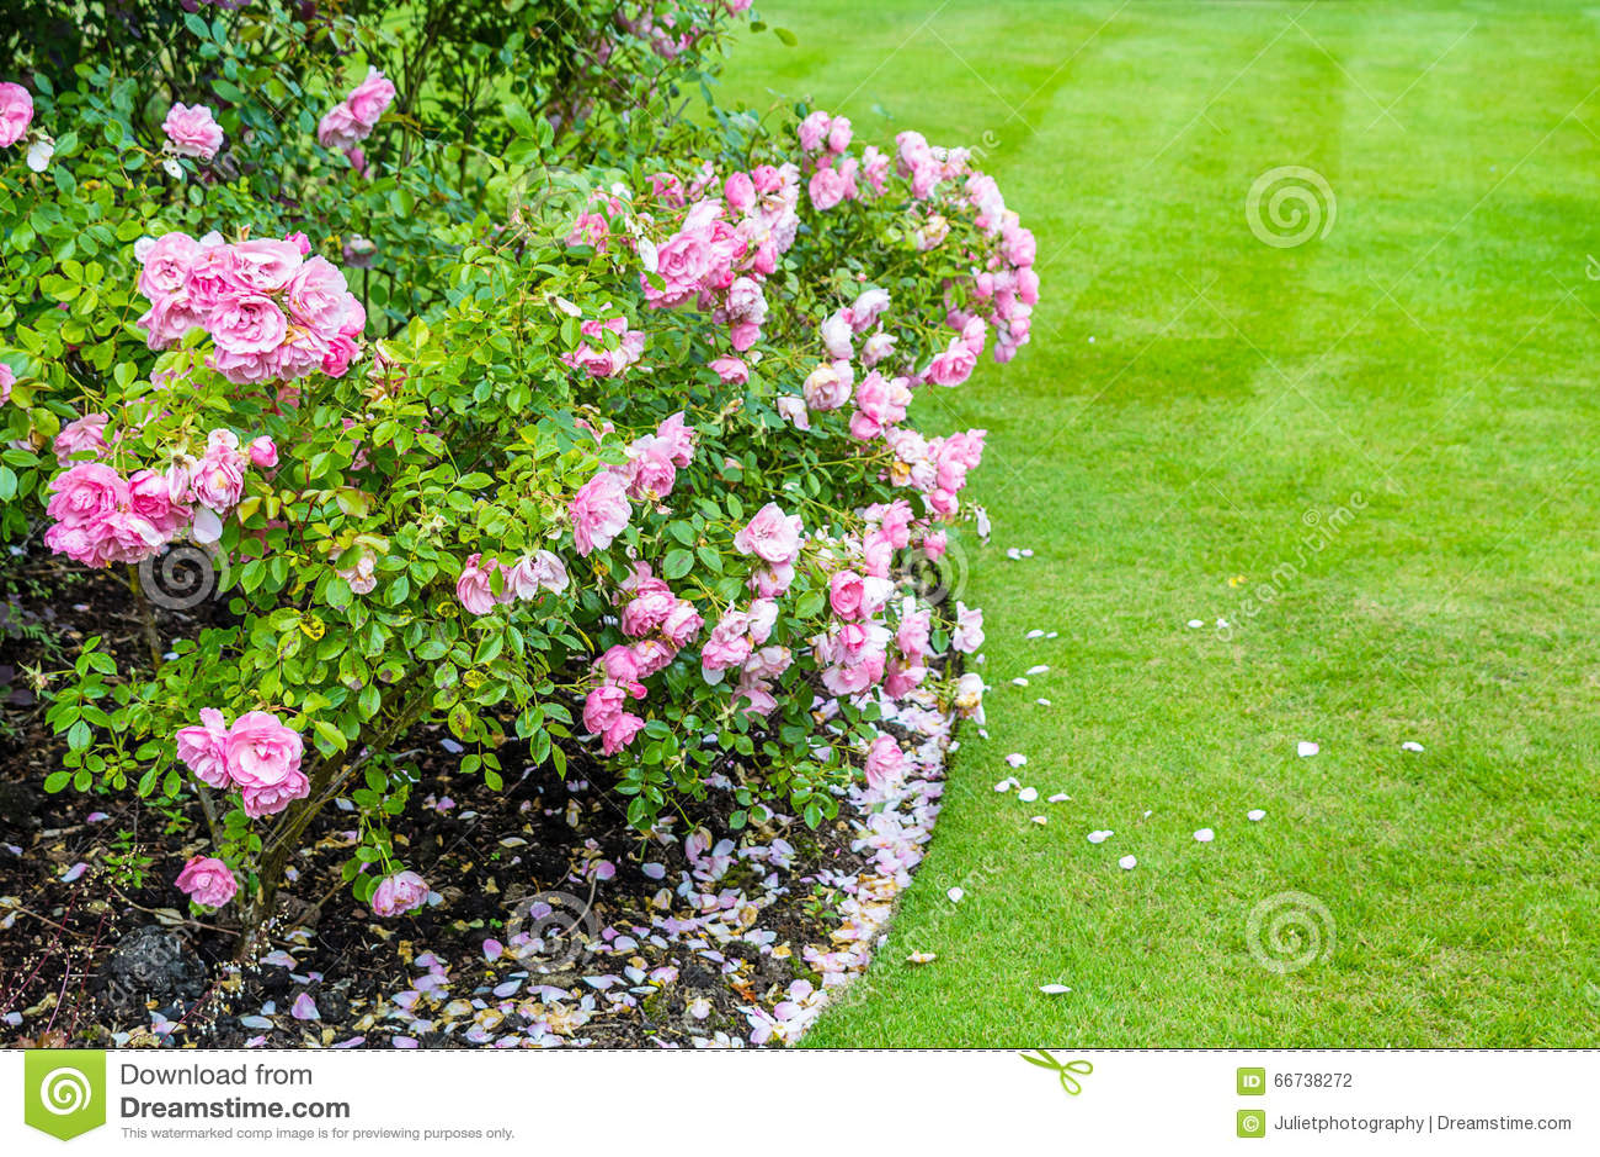 lovely light pink roses bushes in victorian garden stock. Black Bedroom Furniture Sets. Home Design Ideas